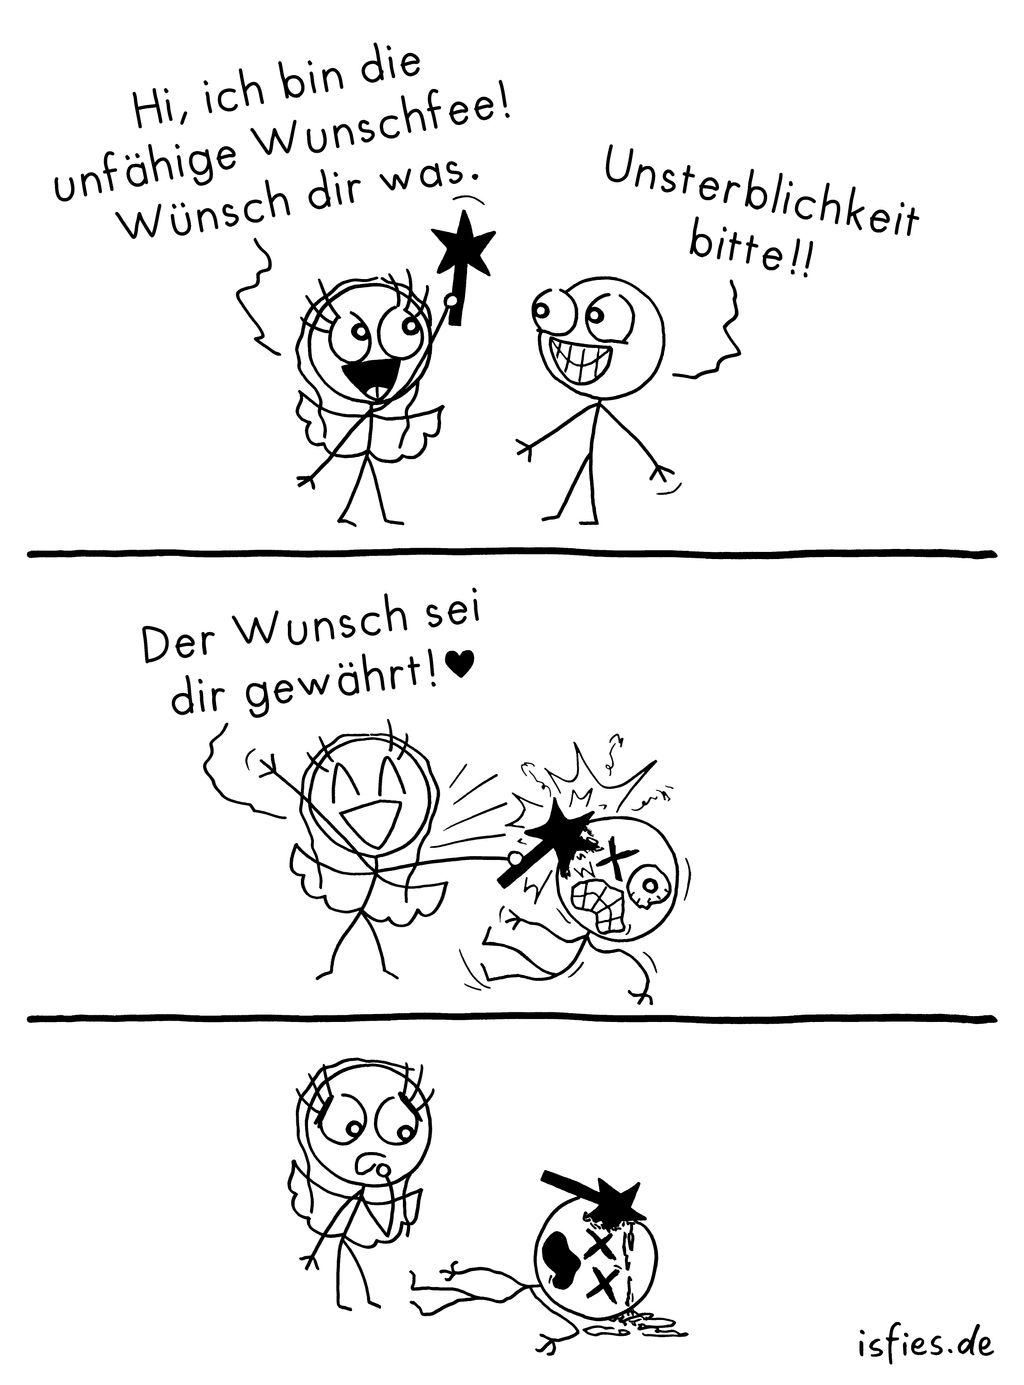 Wunschfee3